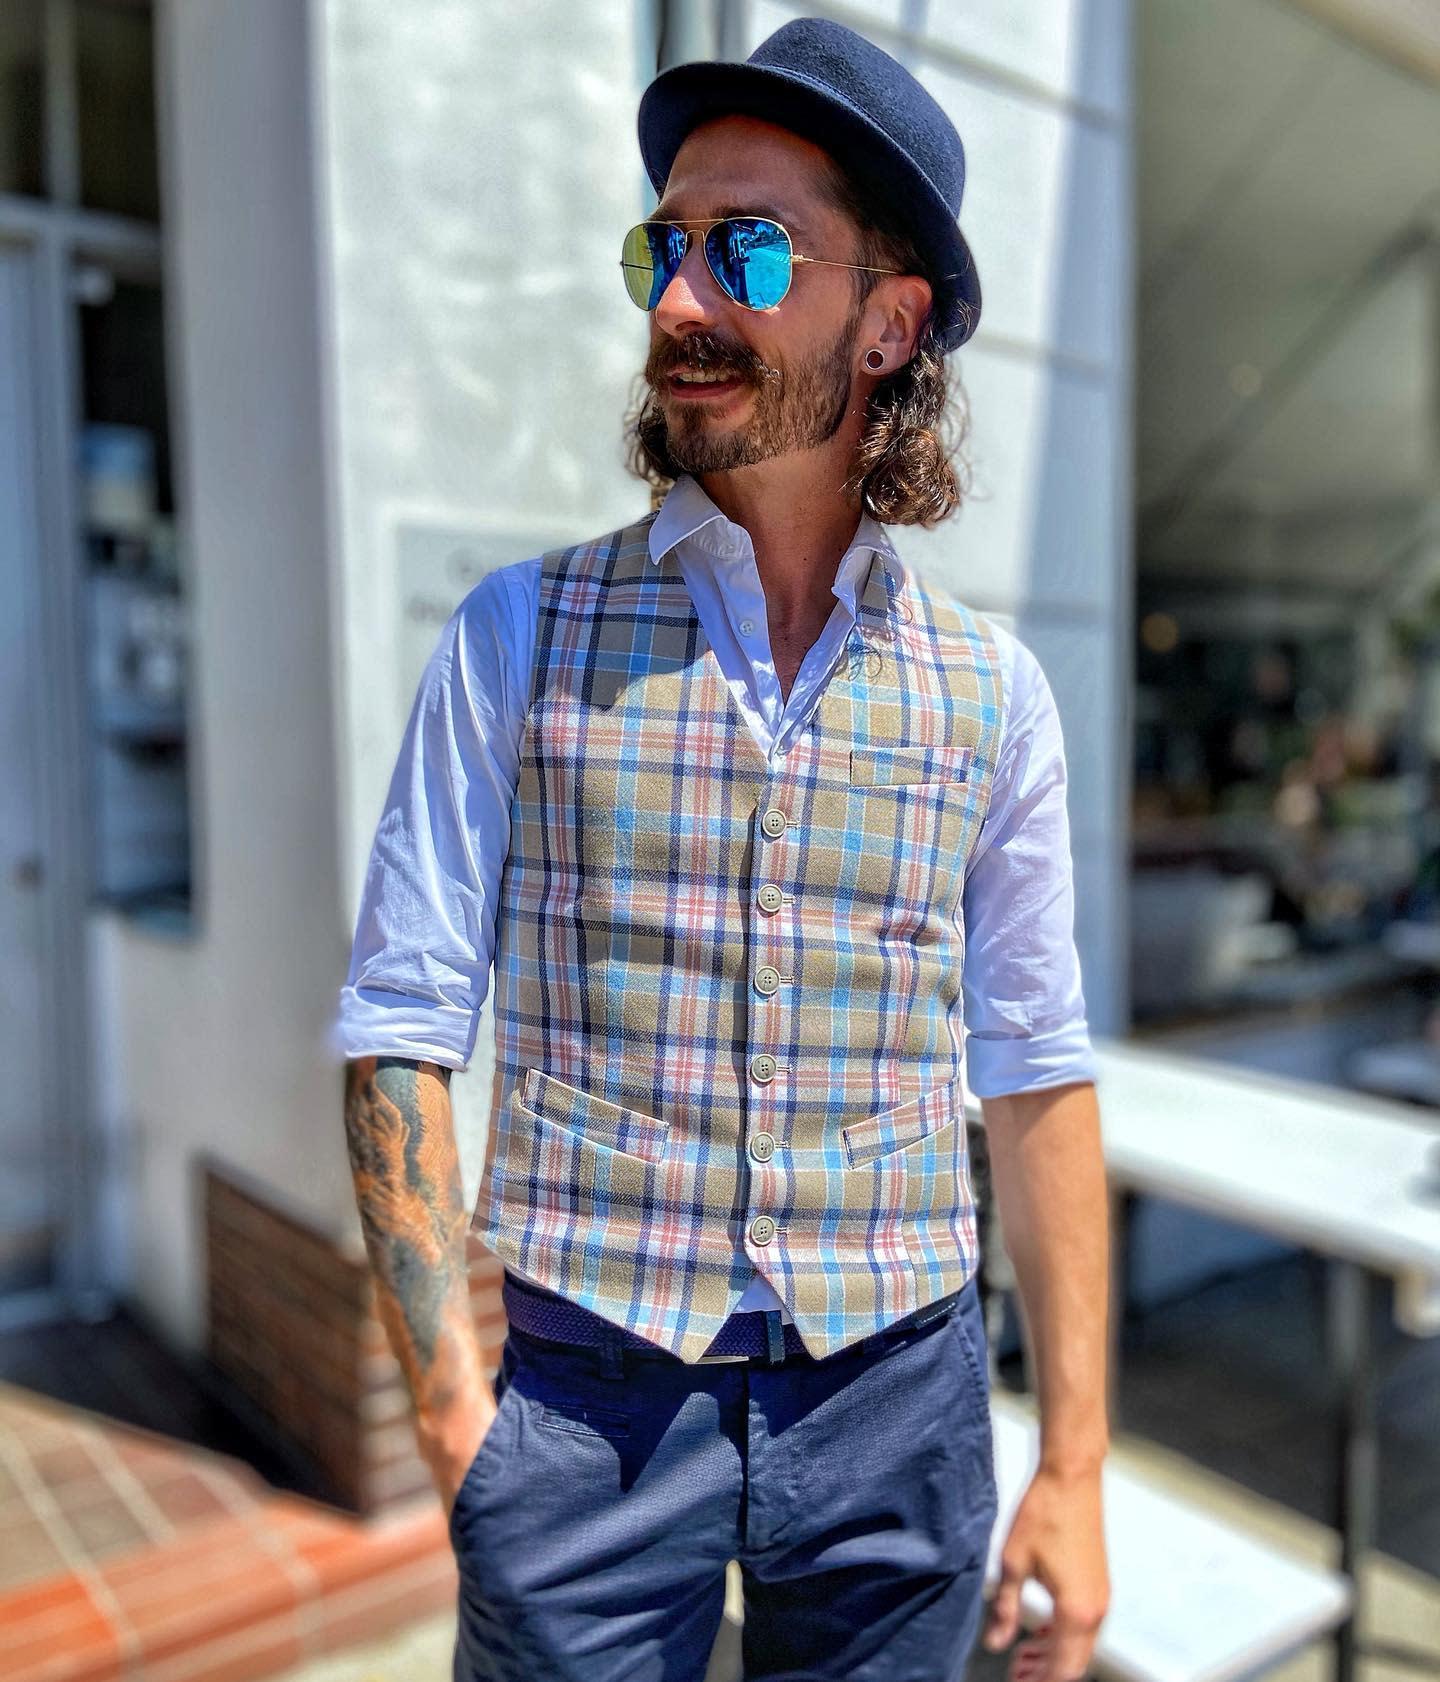 Weste Herren Formelle Kleidung -the.gentleman.side